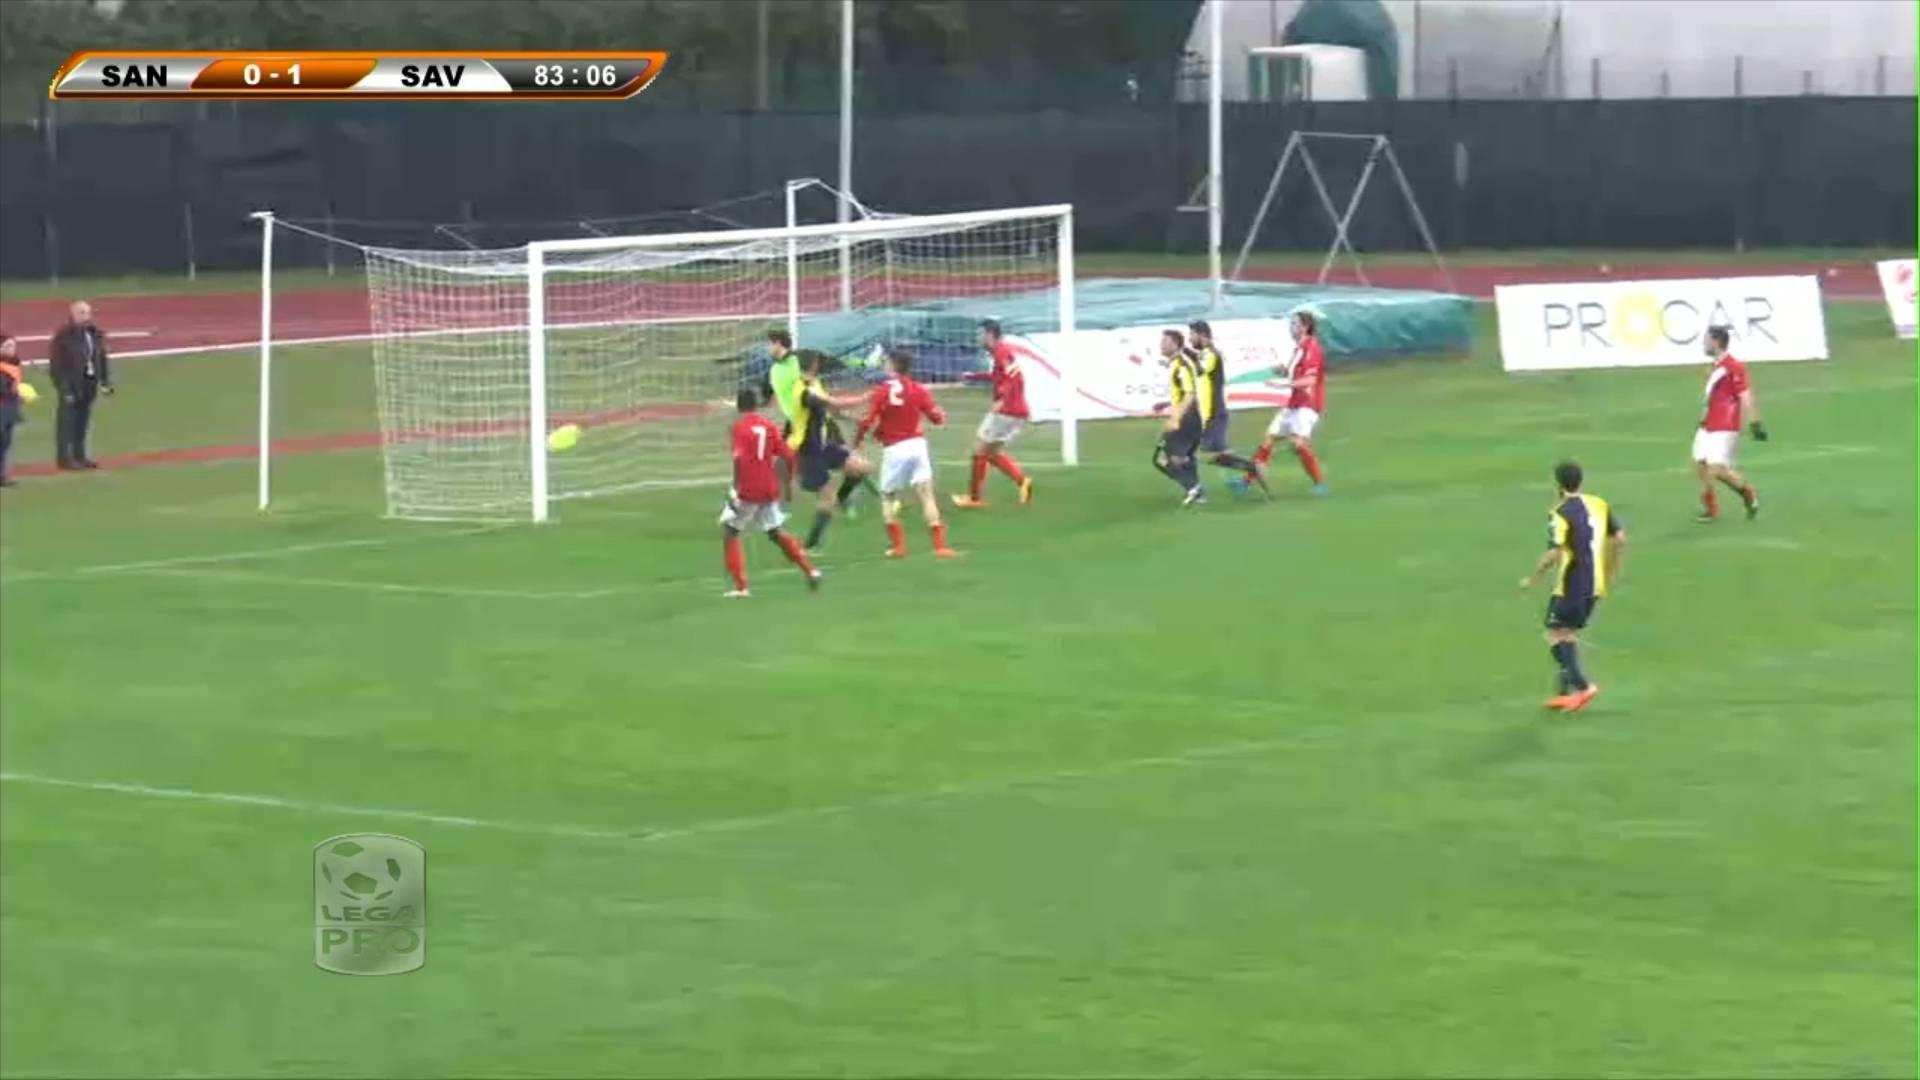 Santarcangelo-Savona 1-1